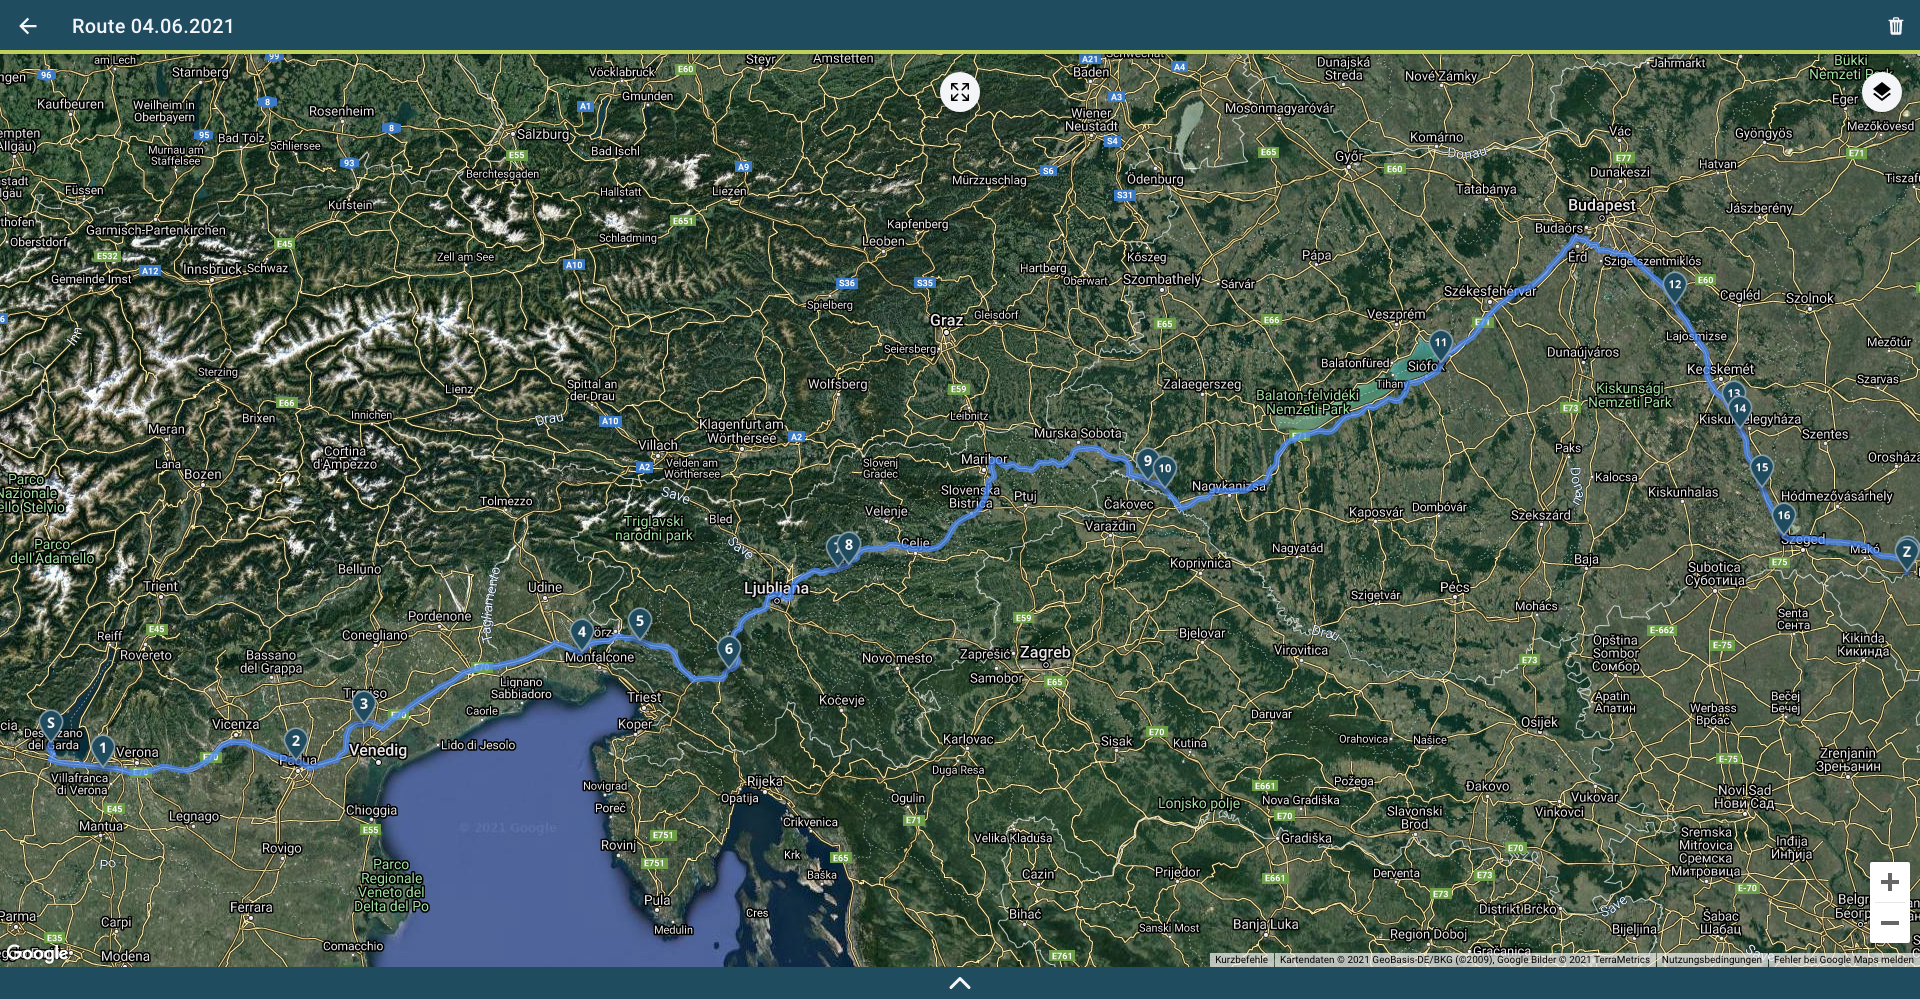 Fahndung per App: GPS-Tracker stoppt E-Bike-Diebe nach 1000 Kilometer